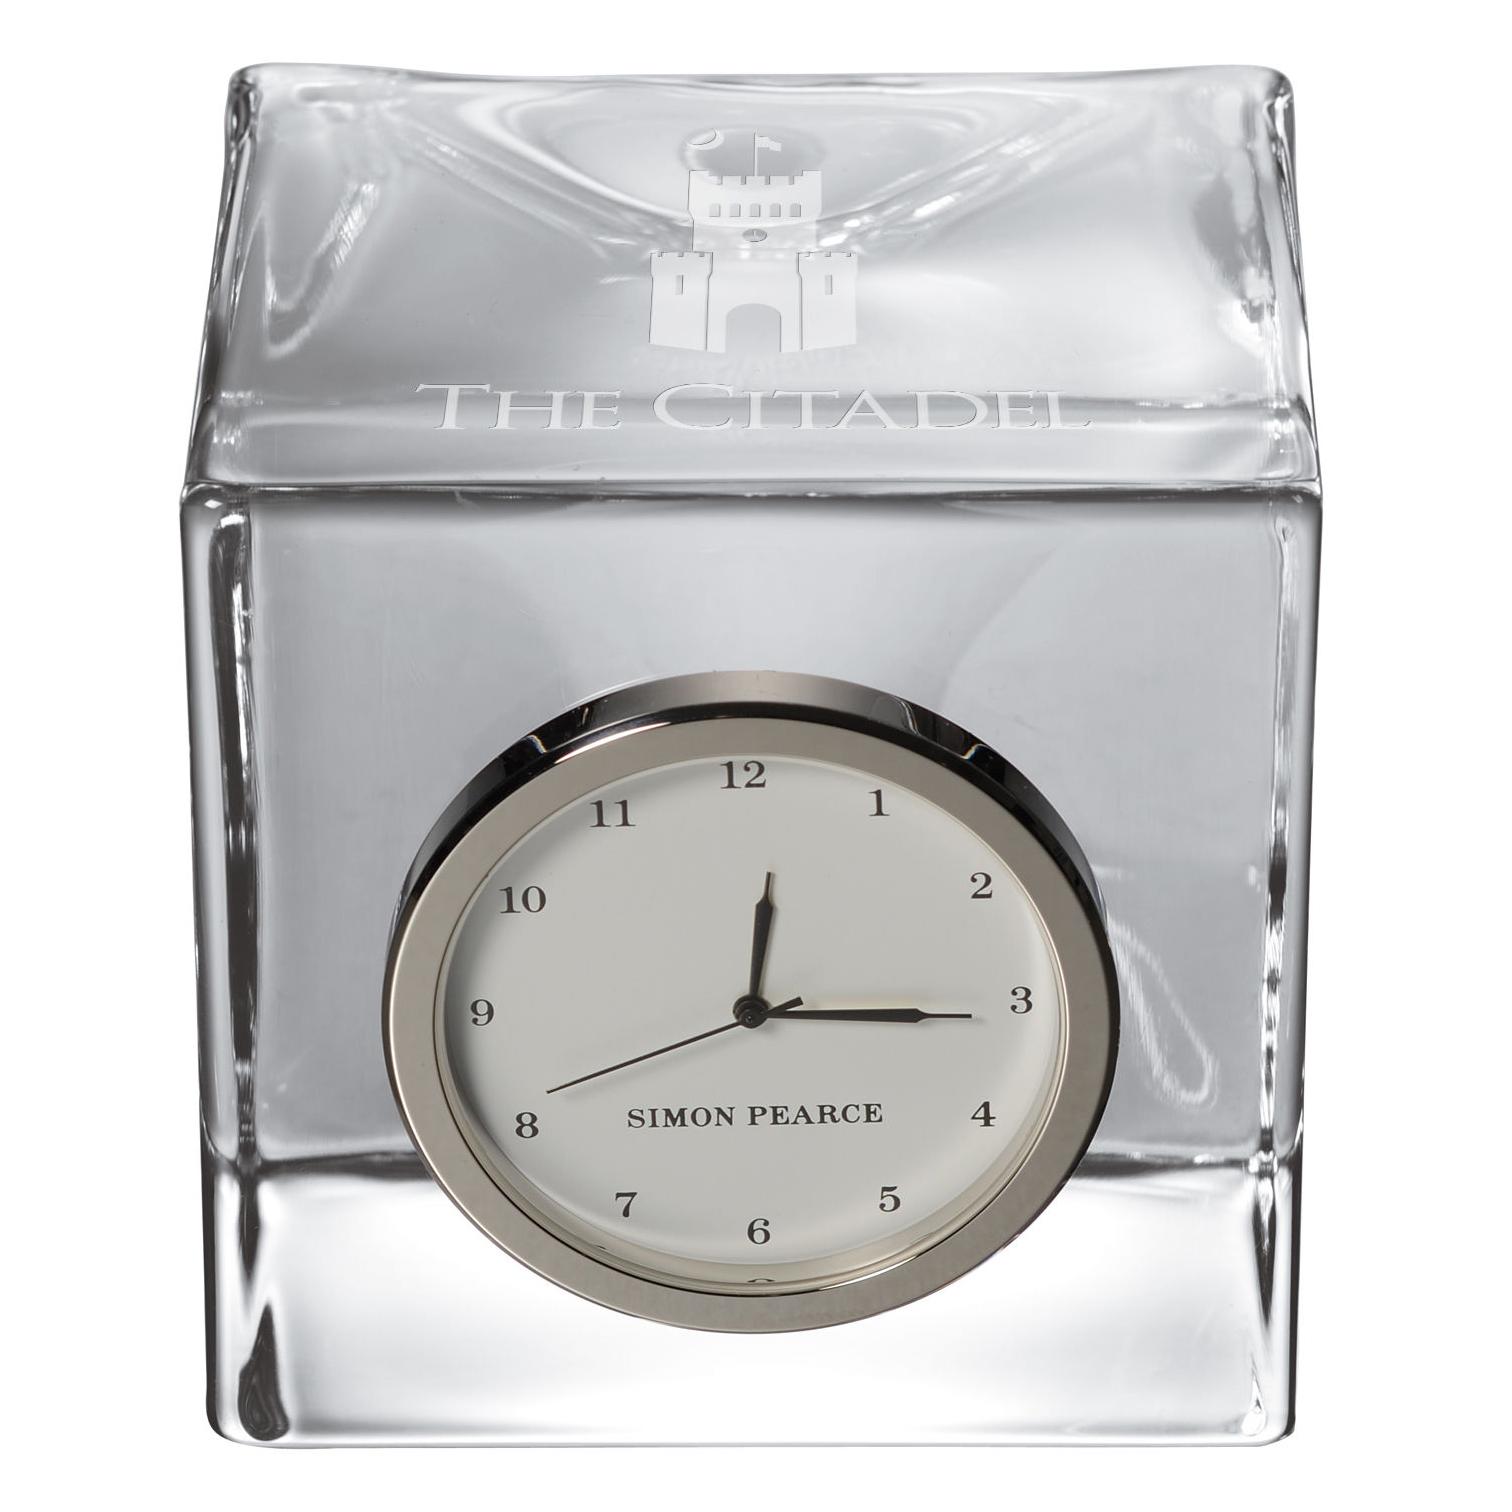 Citadel Glass Desk Clock by Simon Pearce - Image 2